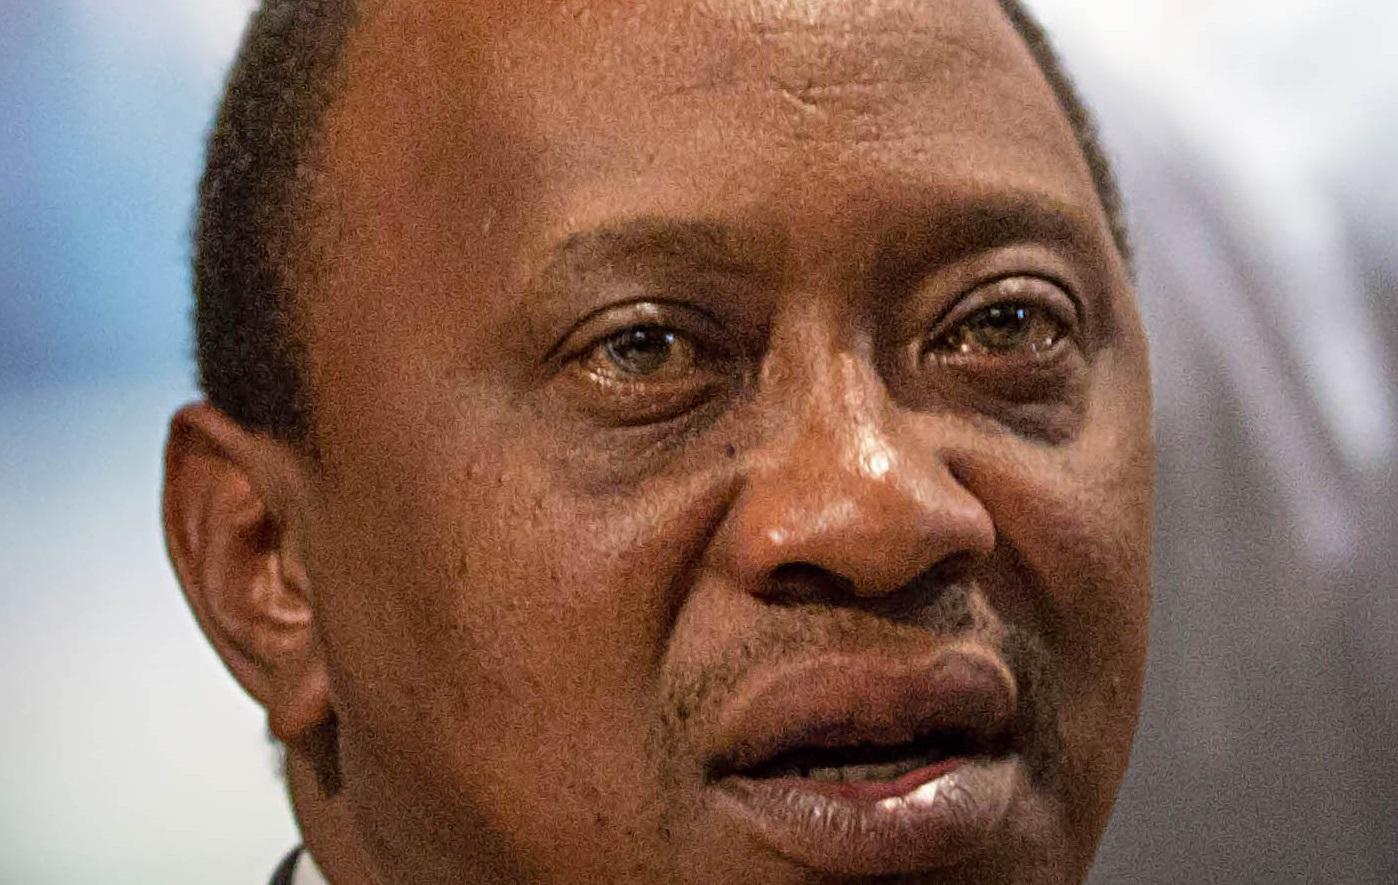 Uhuru Kenyatta and economy www.businesstoday.co.ke